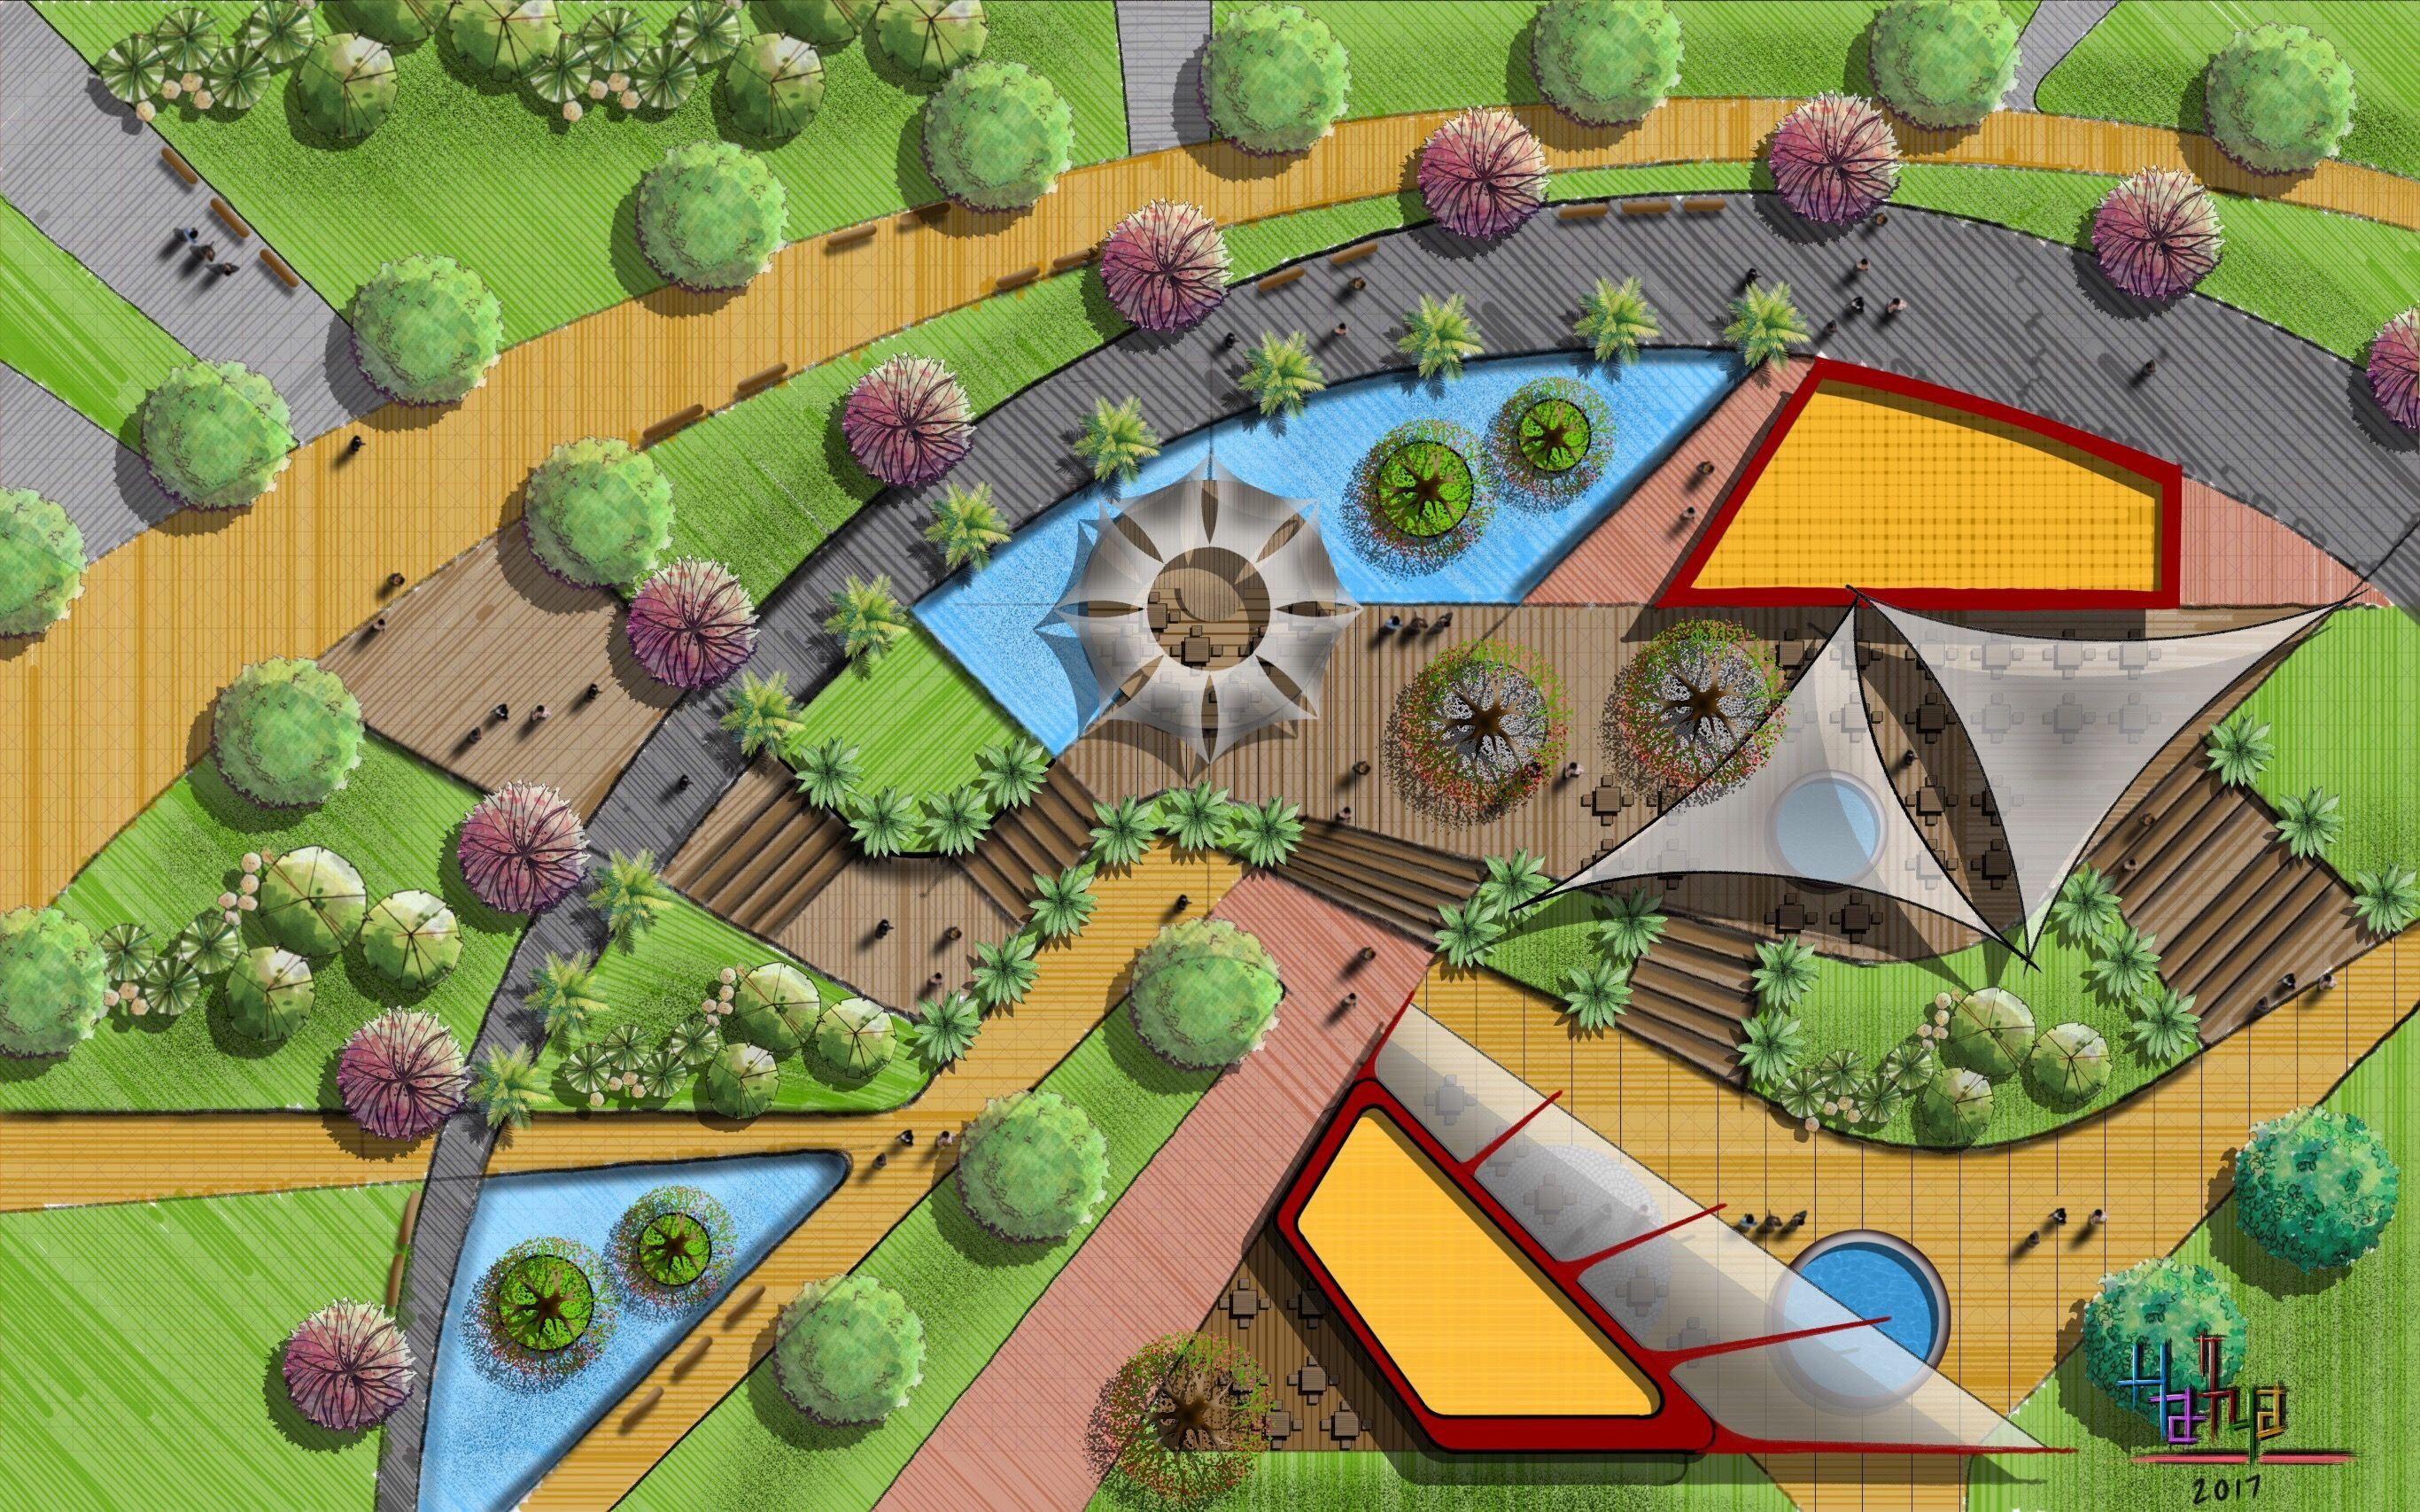 Best Of How to Design Landscape